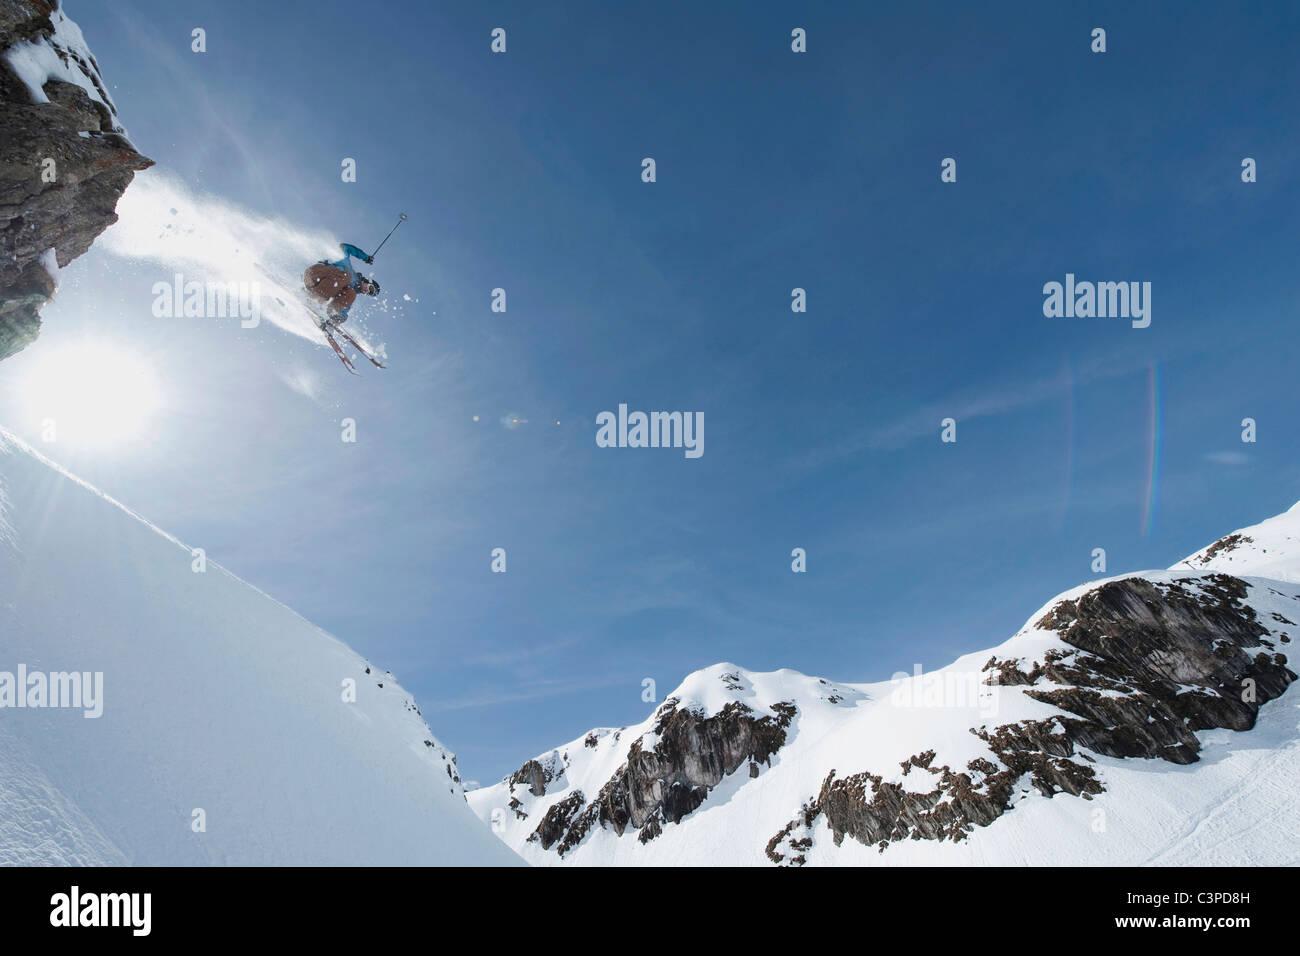 Austria, Arlberg, Man skiing downhill, doing jump, low angle view - Stock Image